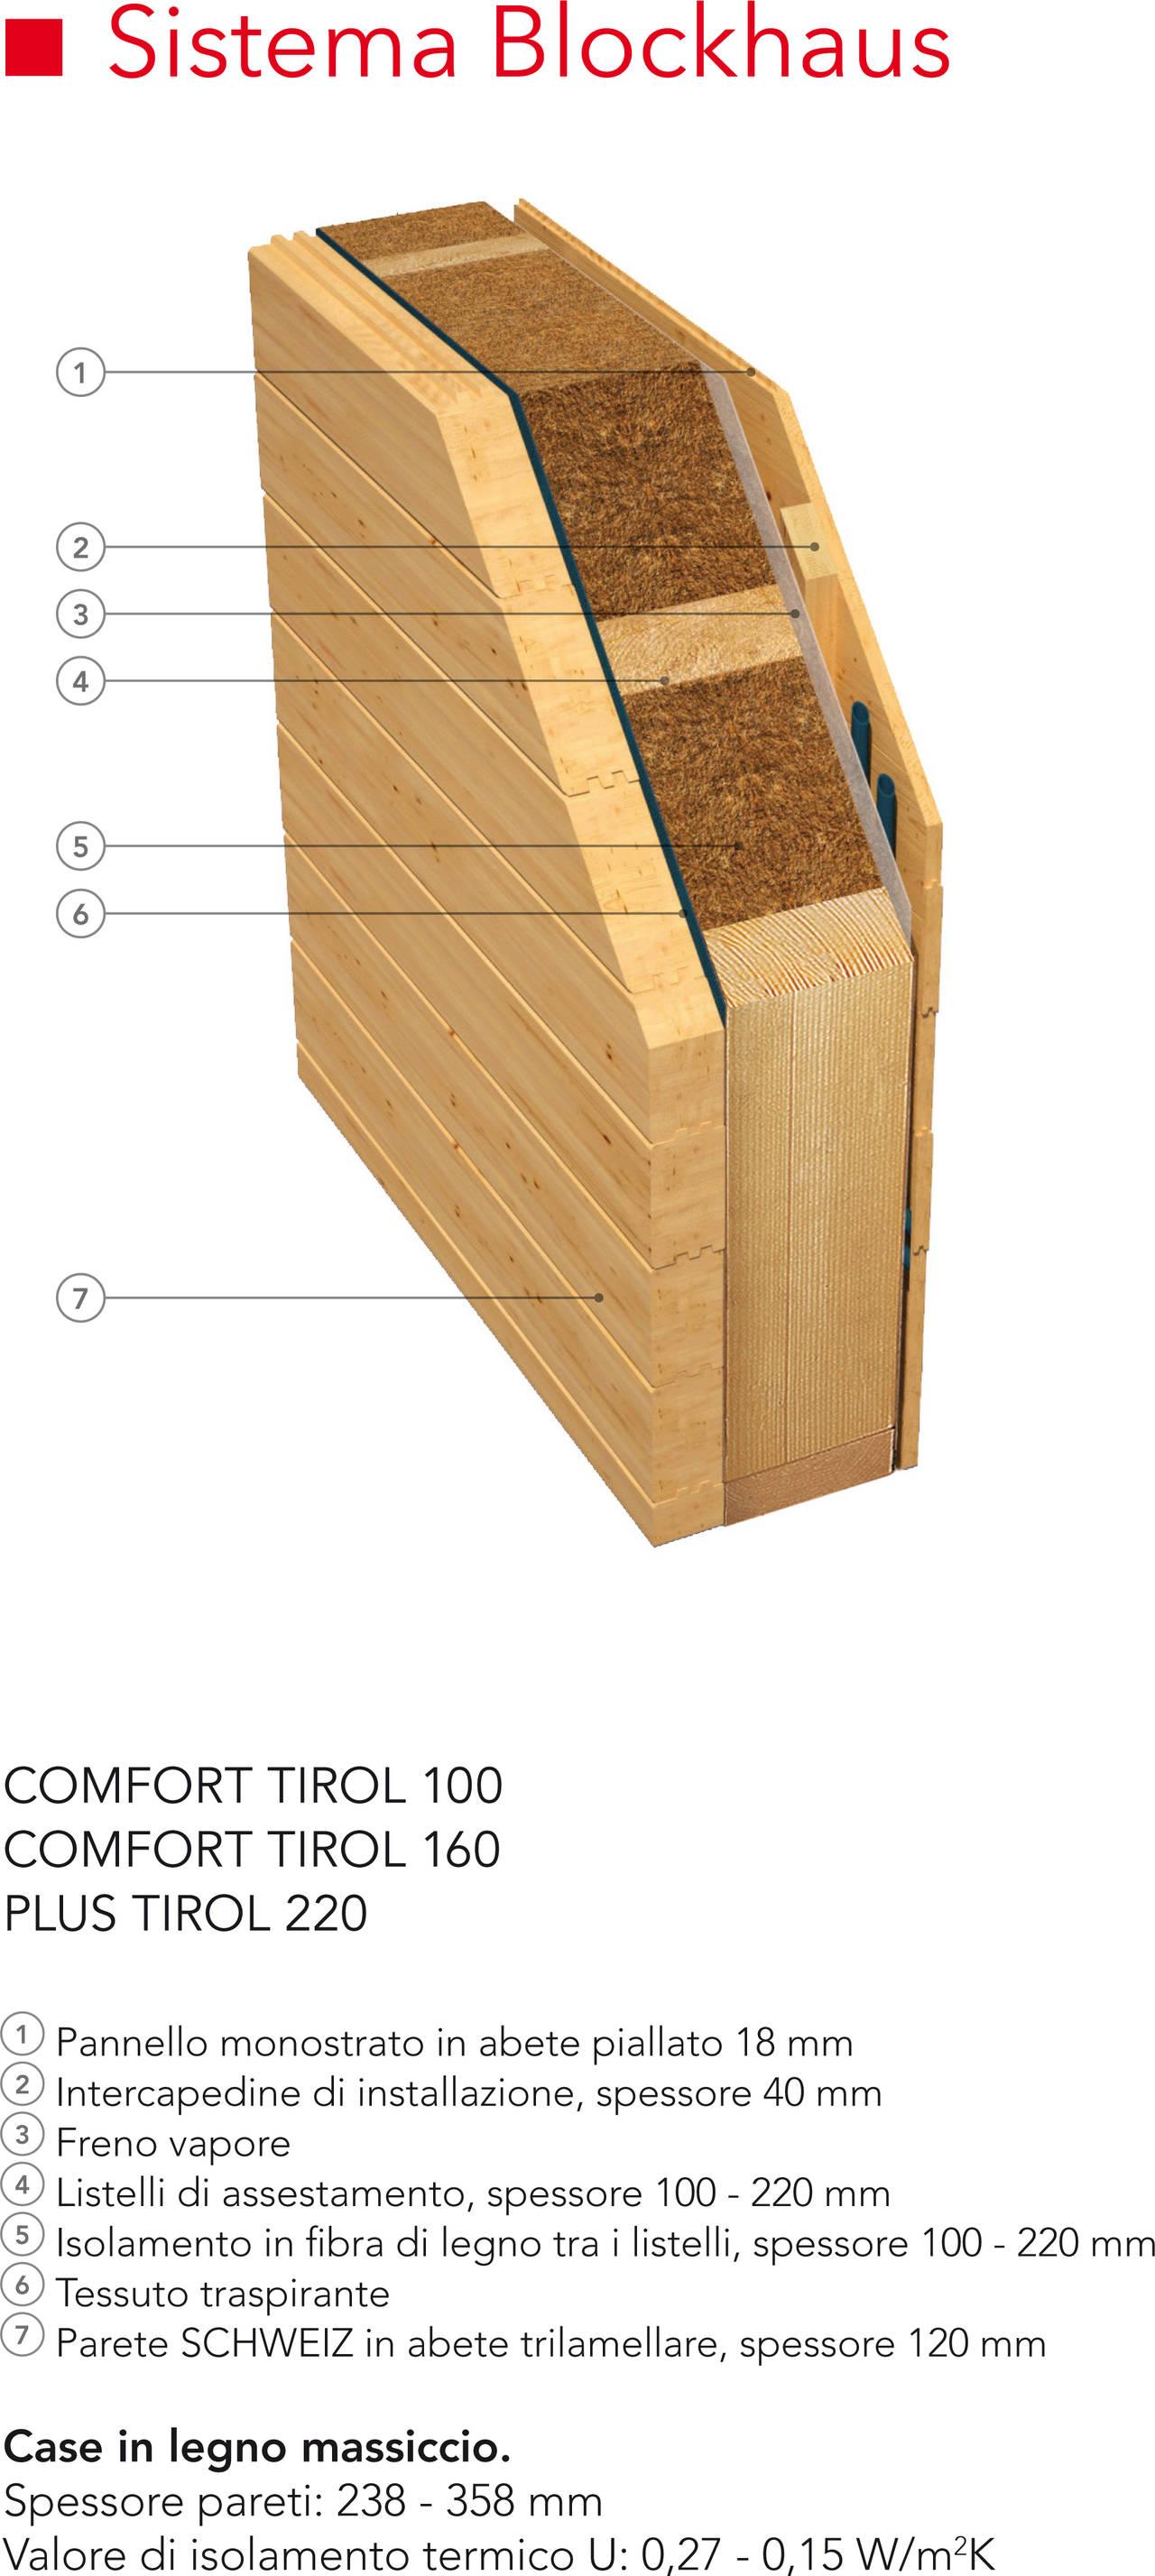 Sistema costruttivo Blockhaus